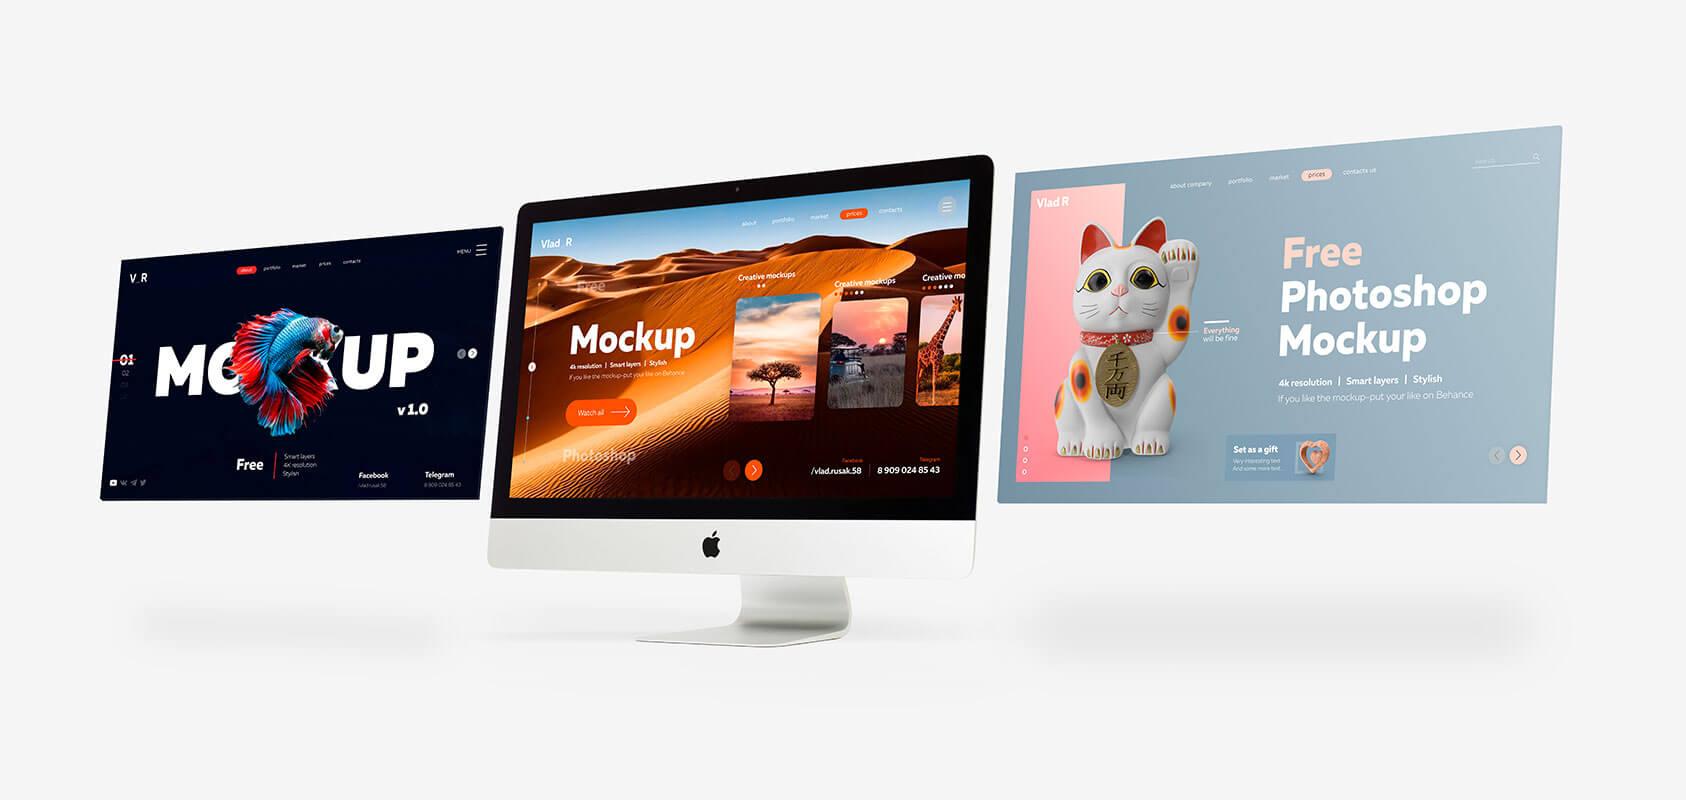 Free-iMac-Desktop-Screen-Mockup-PSD